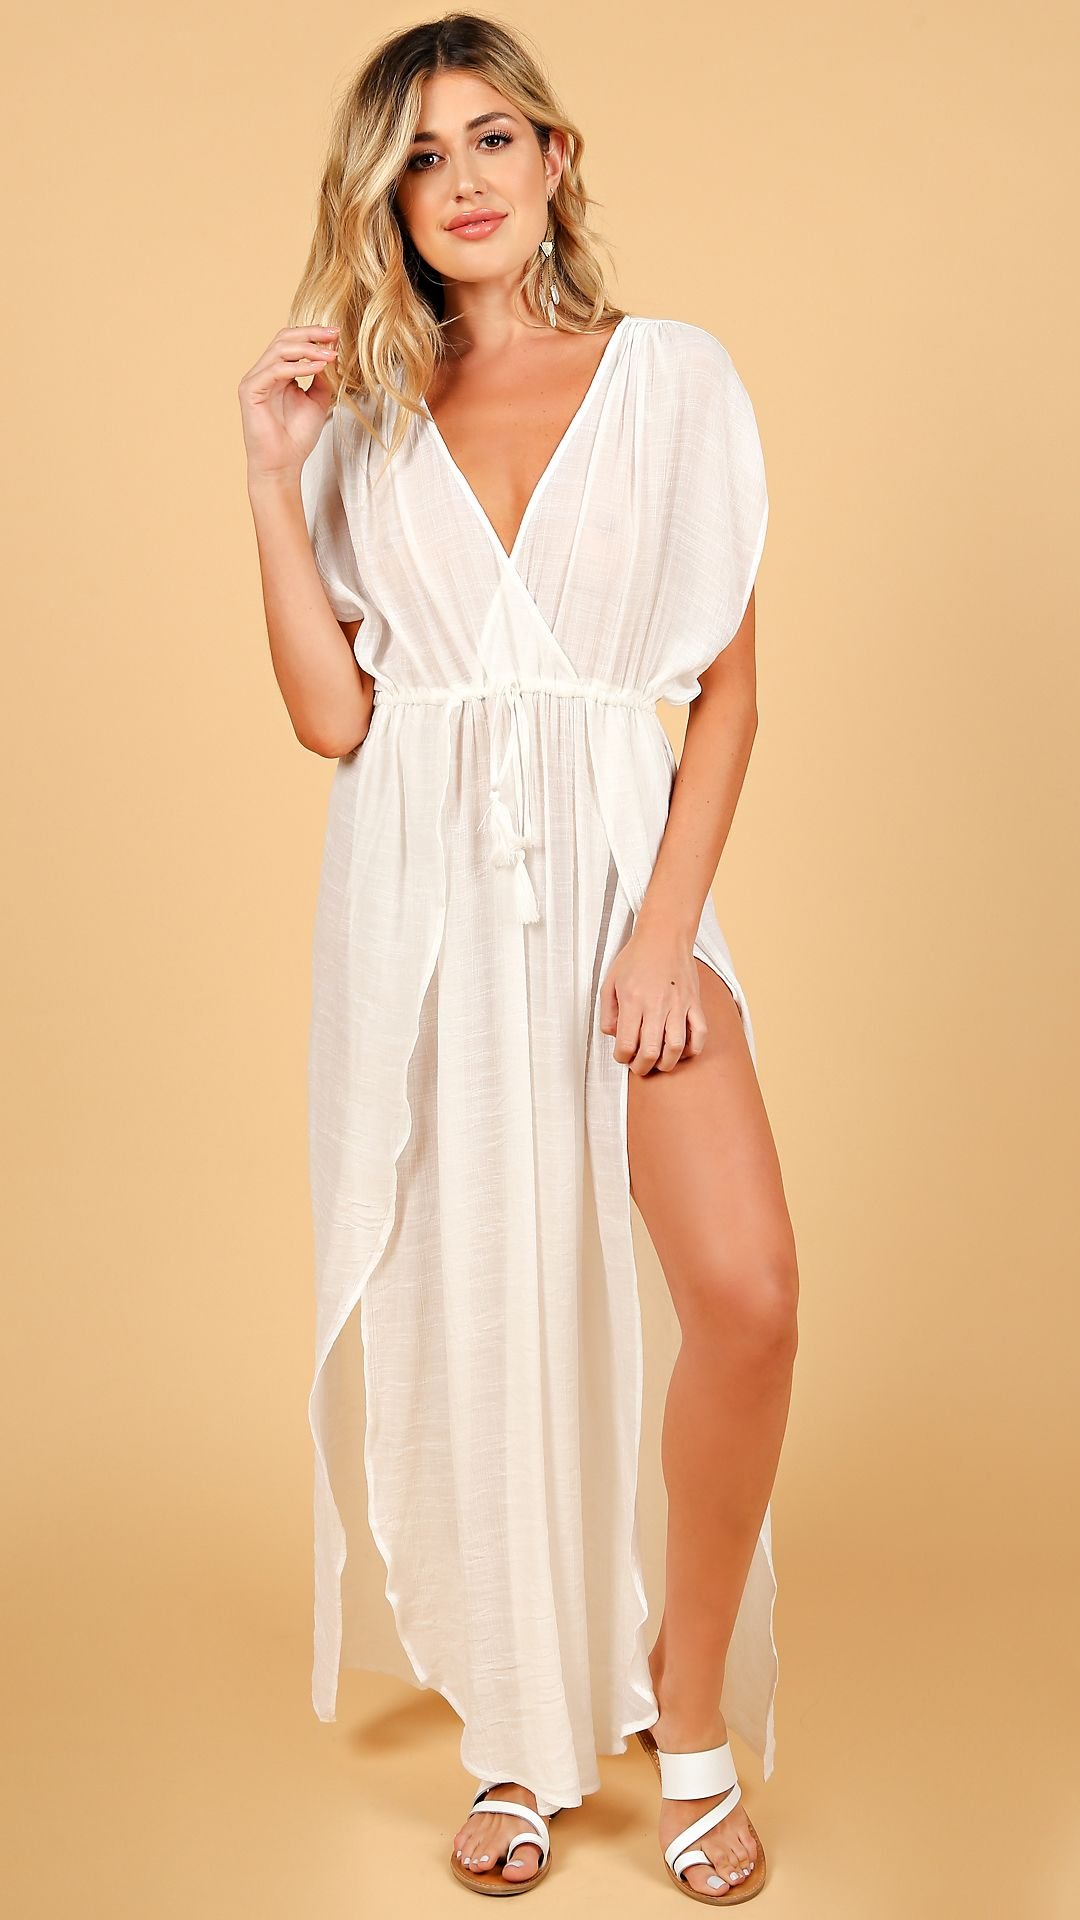 Mykonos Sheer Cover Up Maxi Dress White Sheer maxi